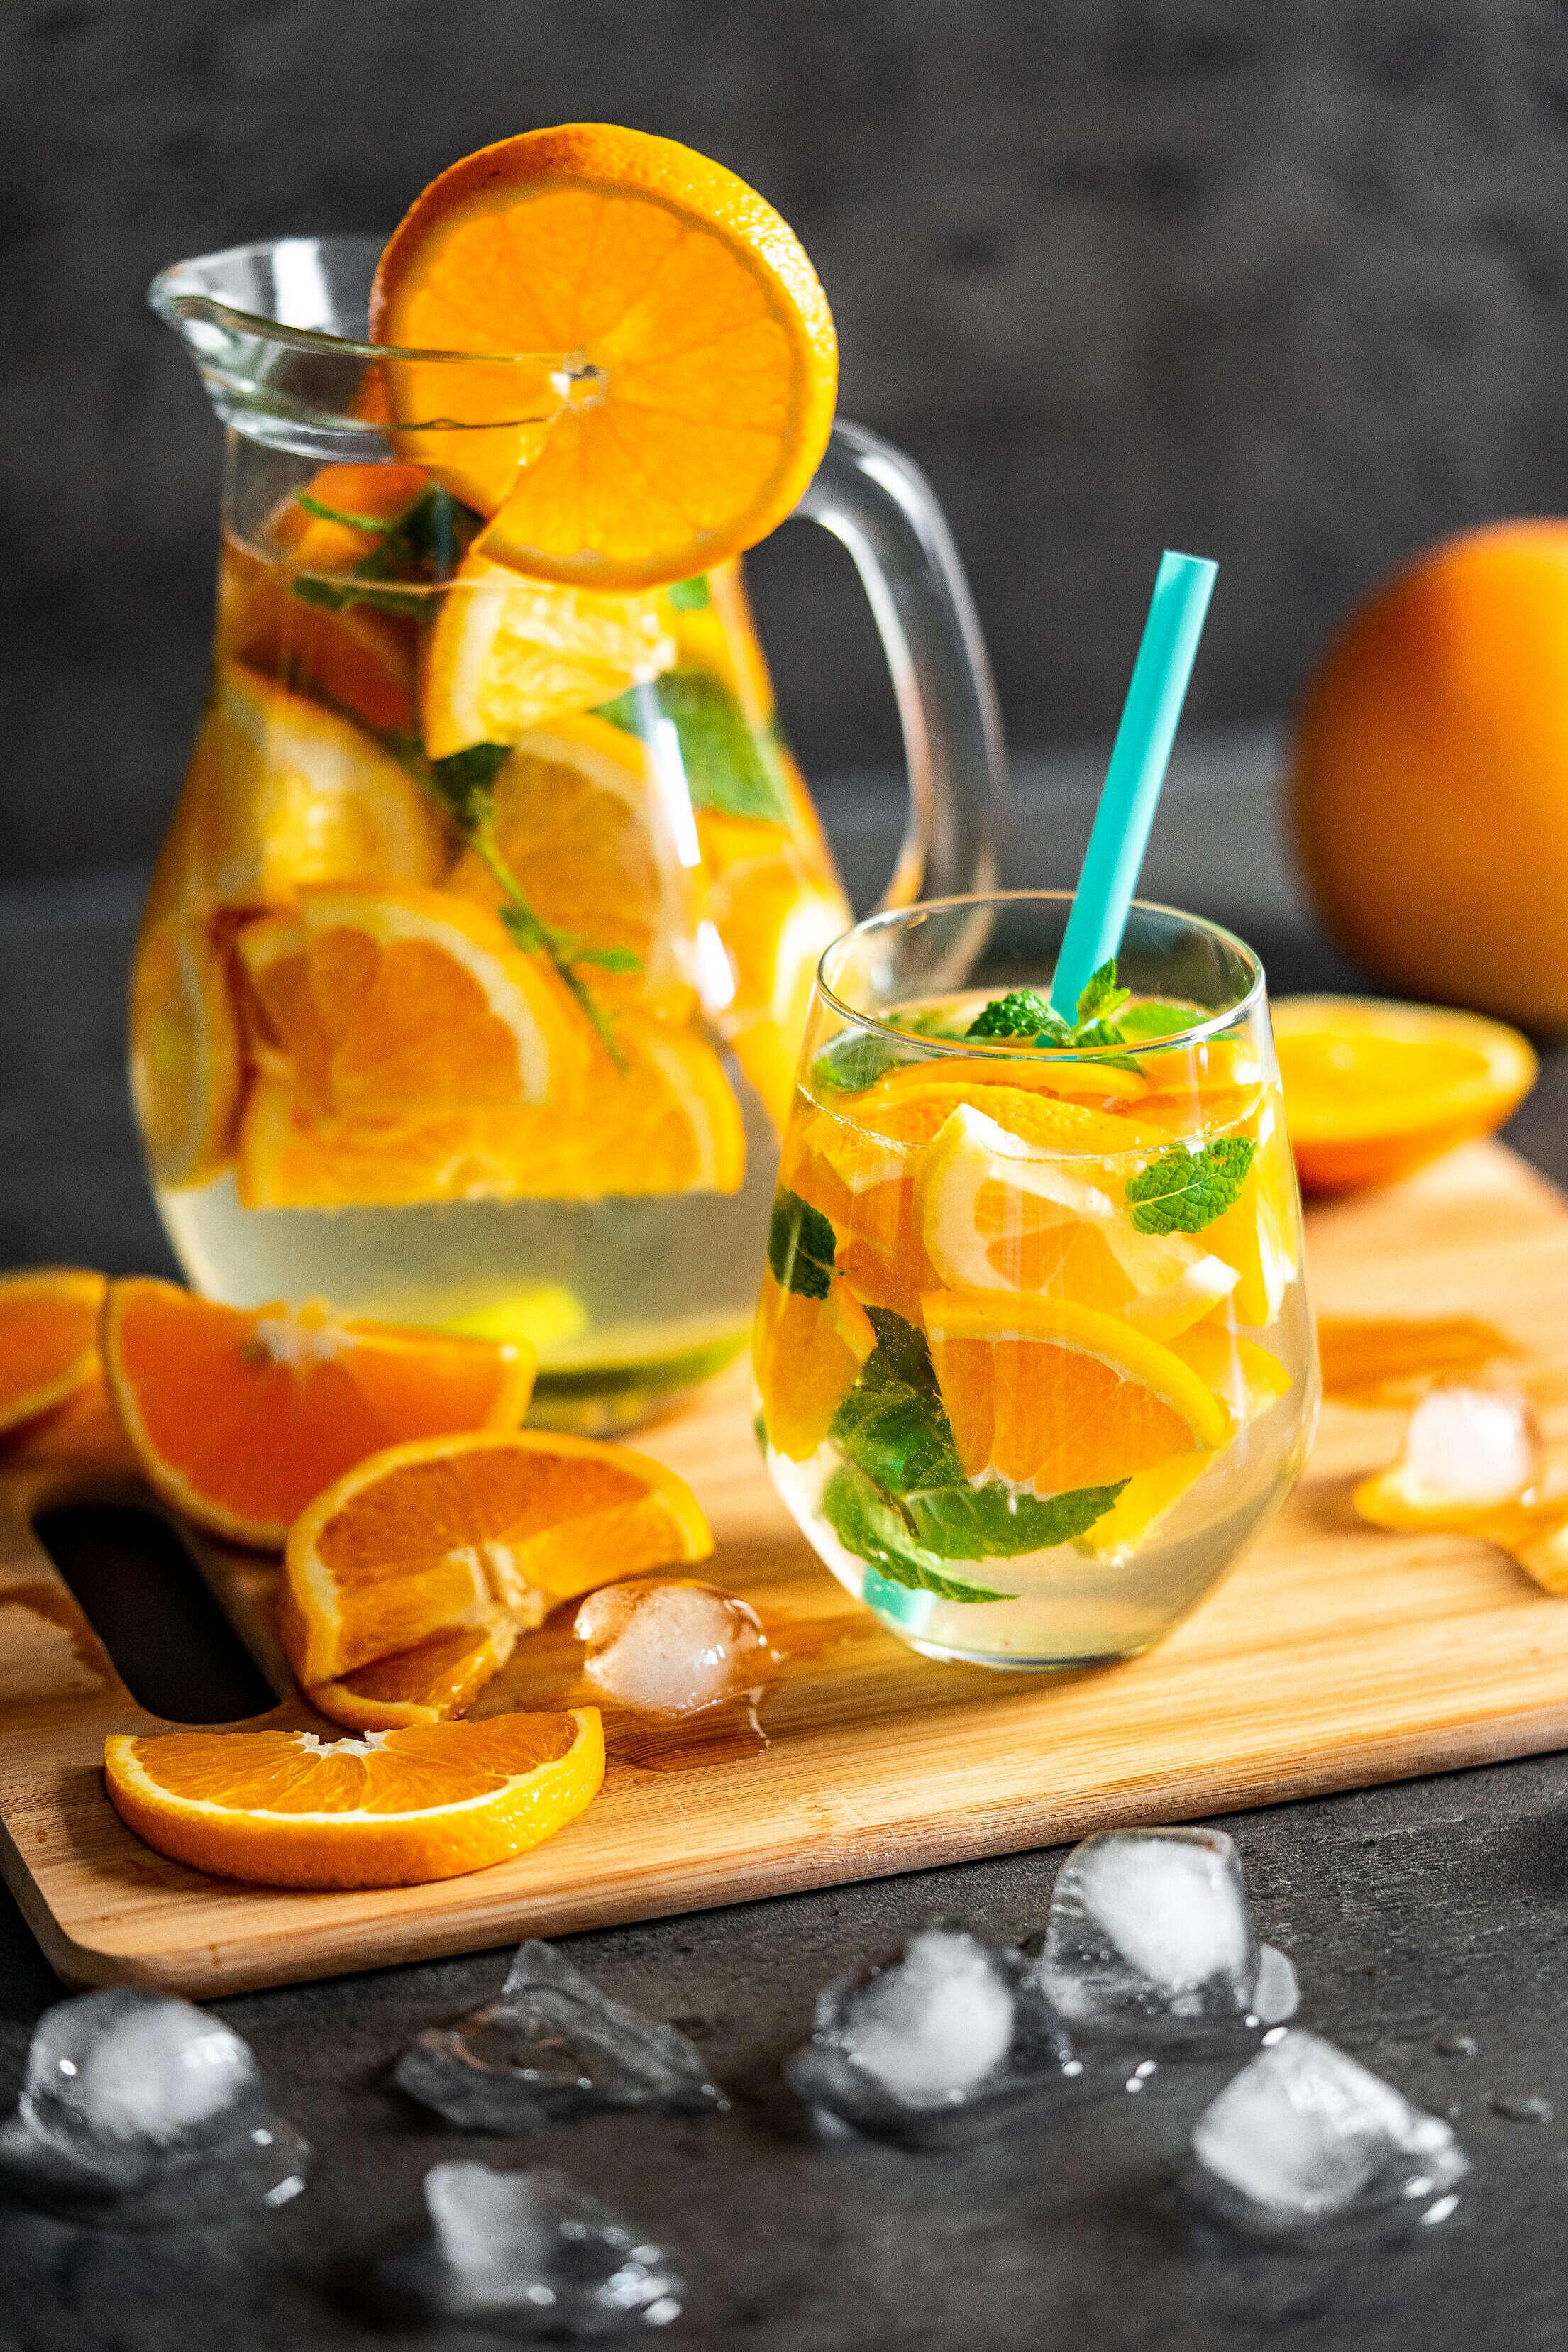 Orange Lemonade in The Jug Free Stock Photo